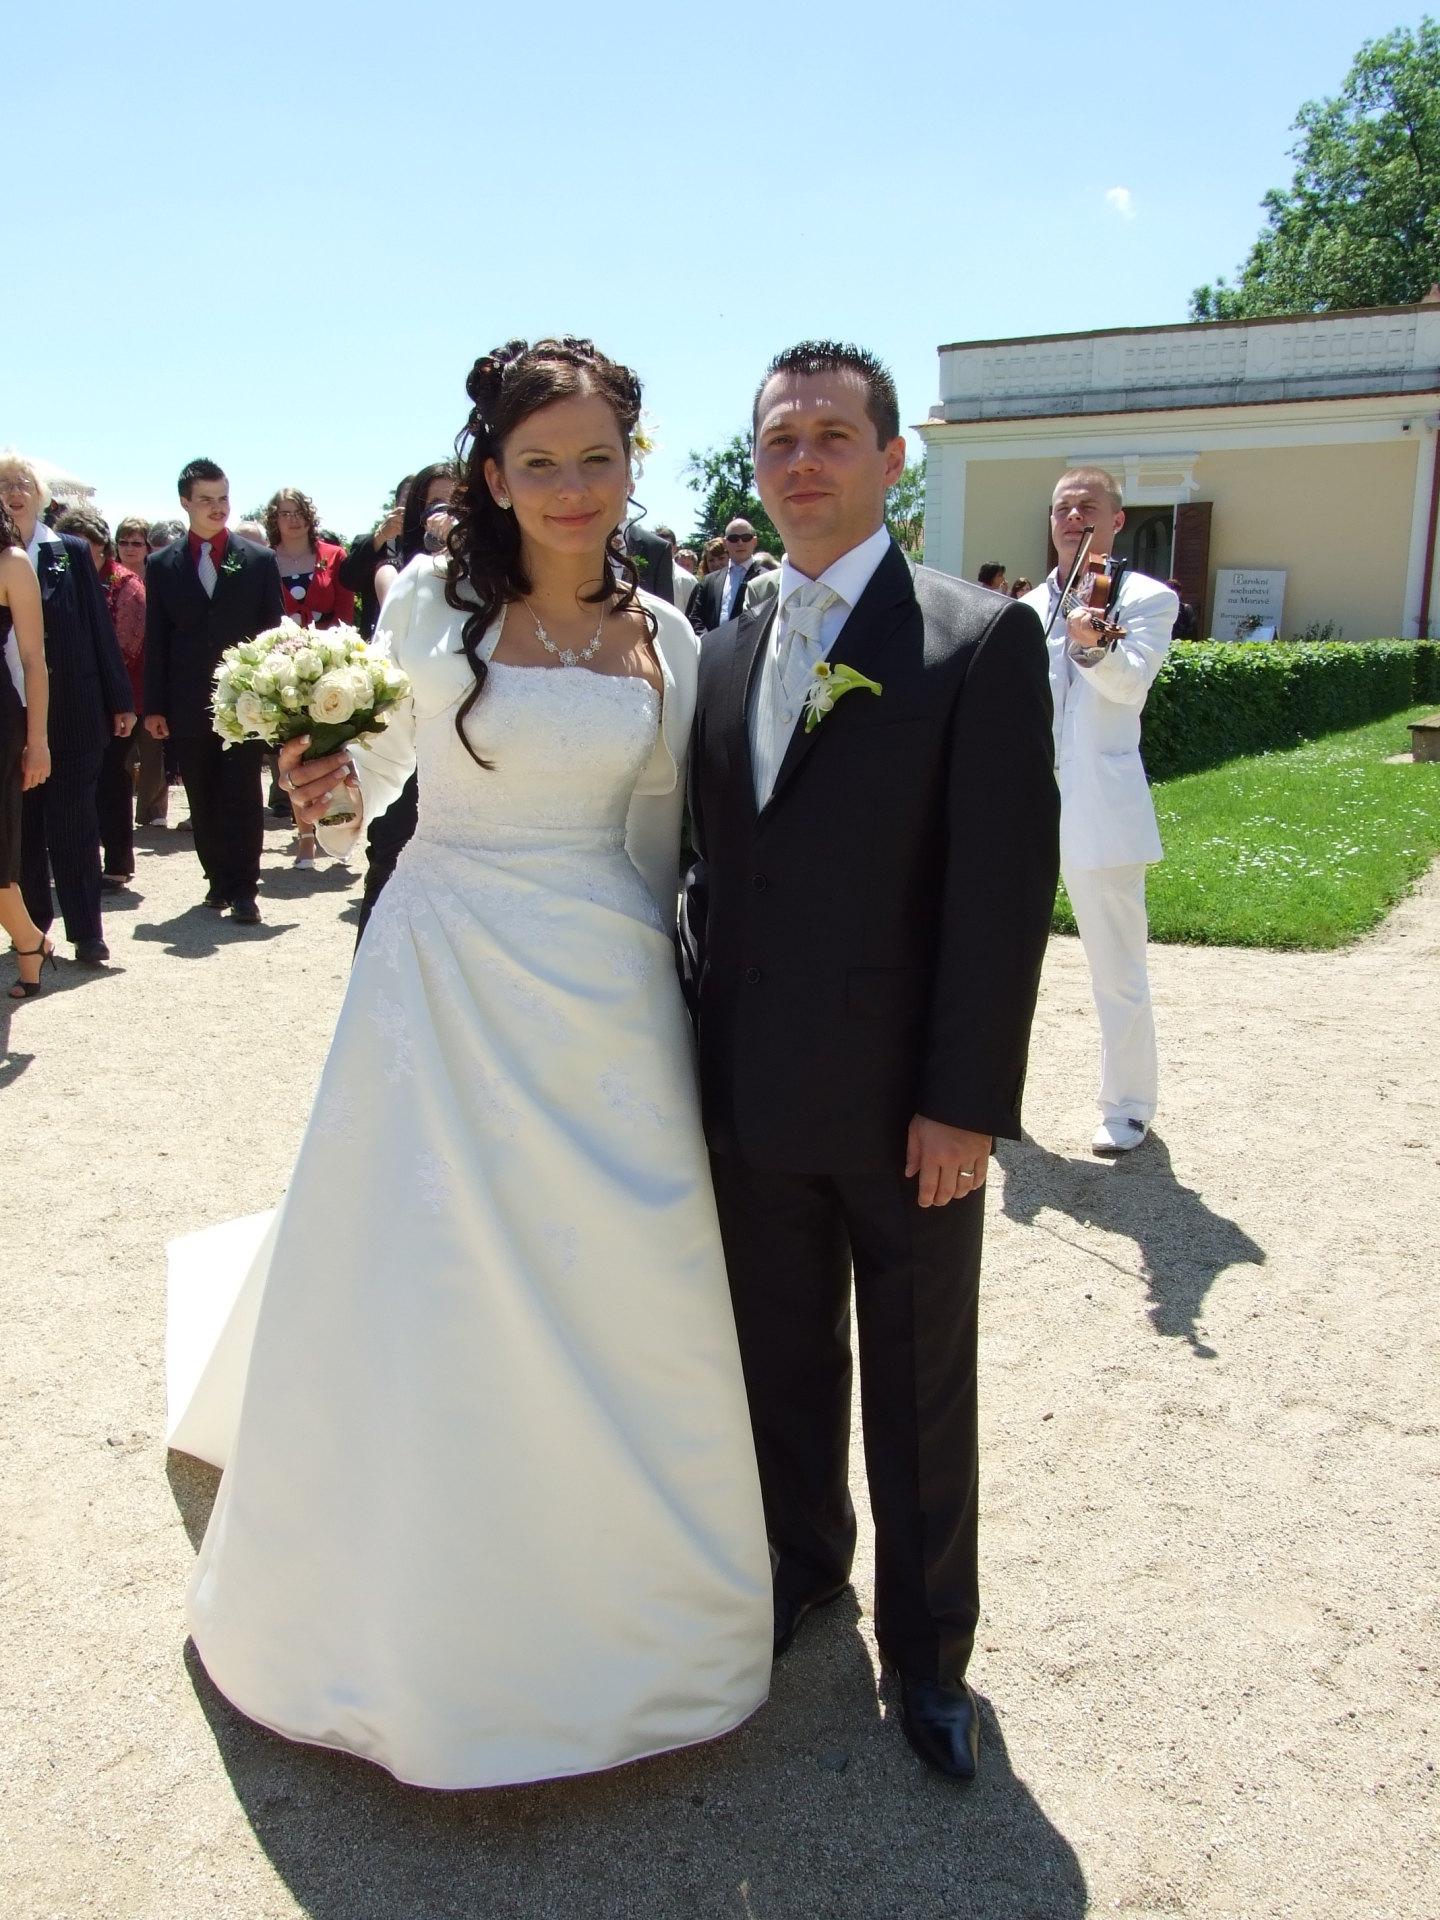 Prosek's Wedding Celebration